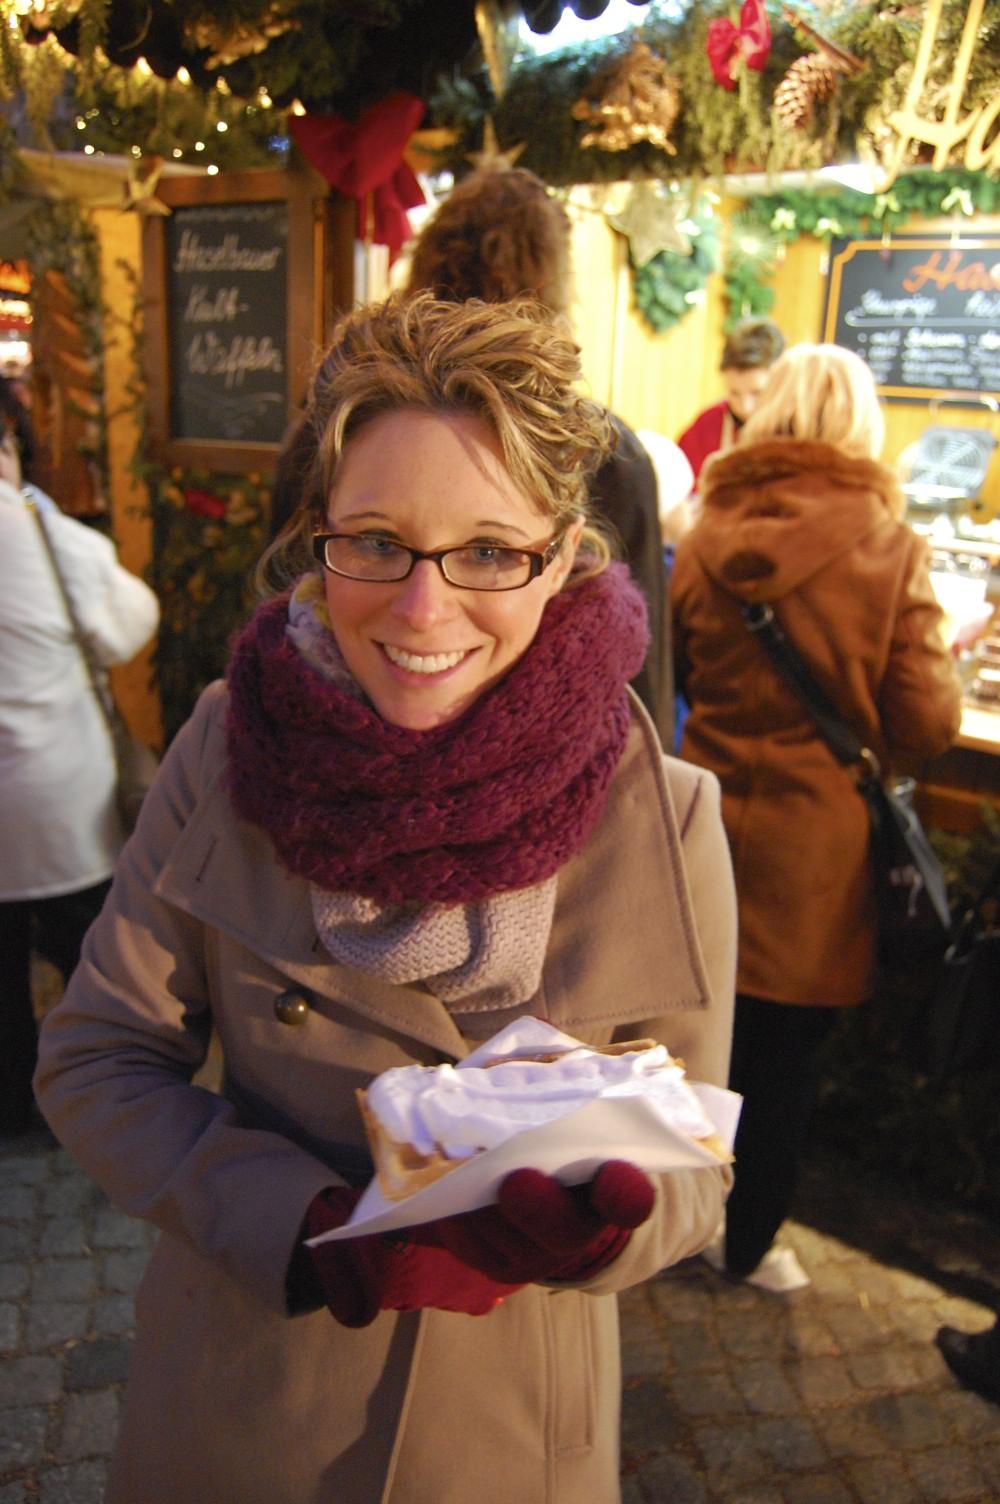 Enjoying the Christmas Markets, Savannah Page